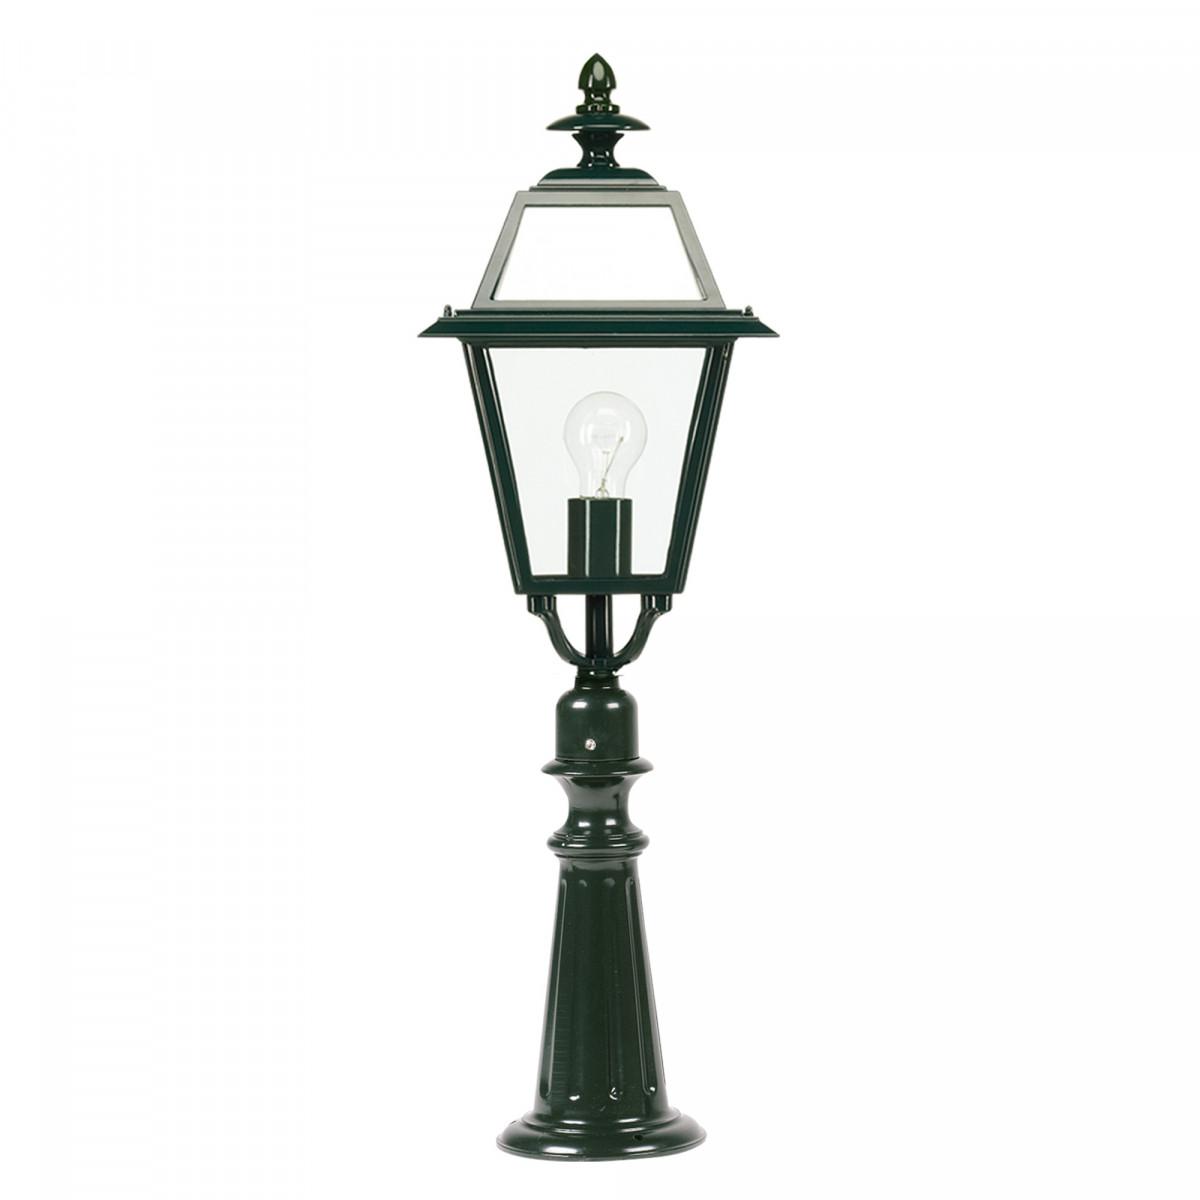 Tuinlamp Doenrade